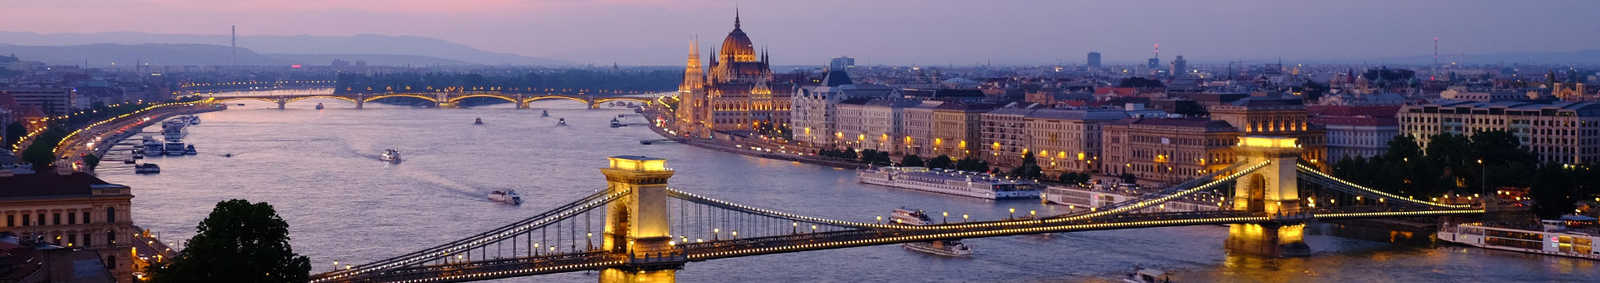 Budapest City at Night